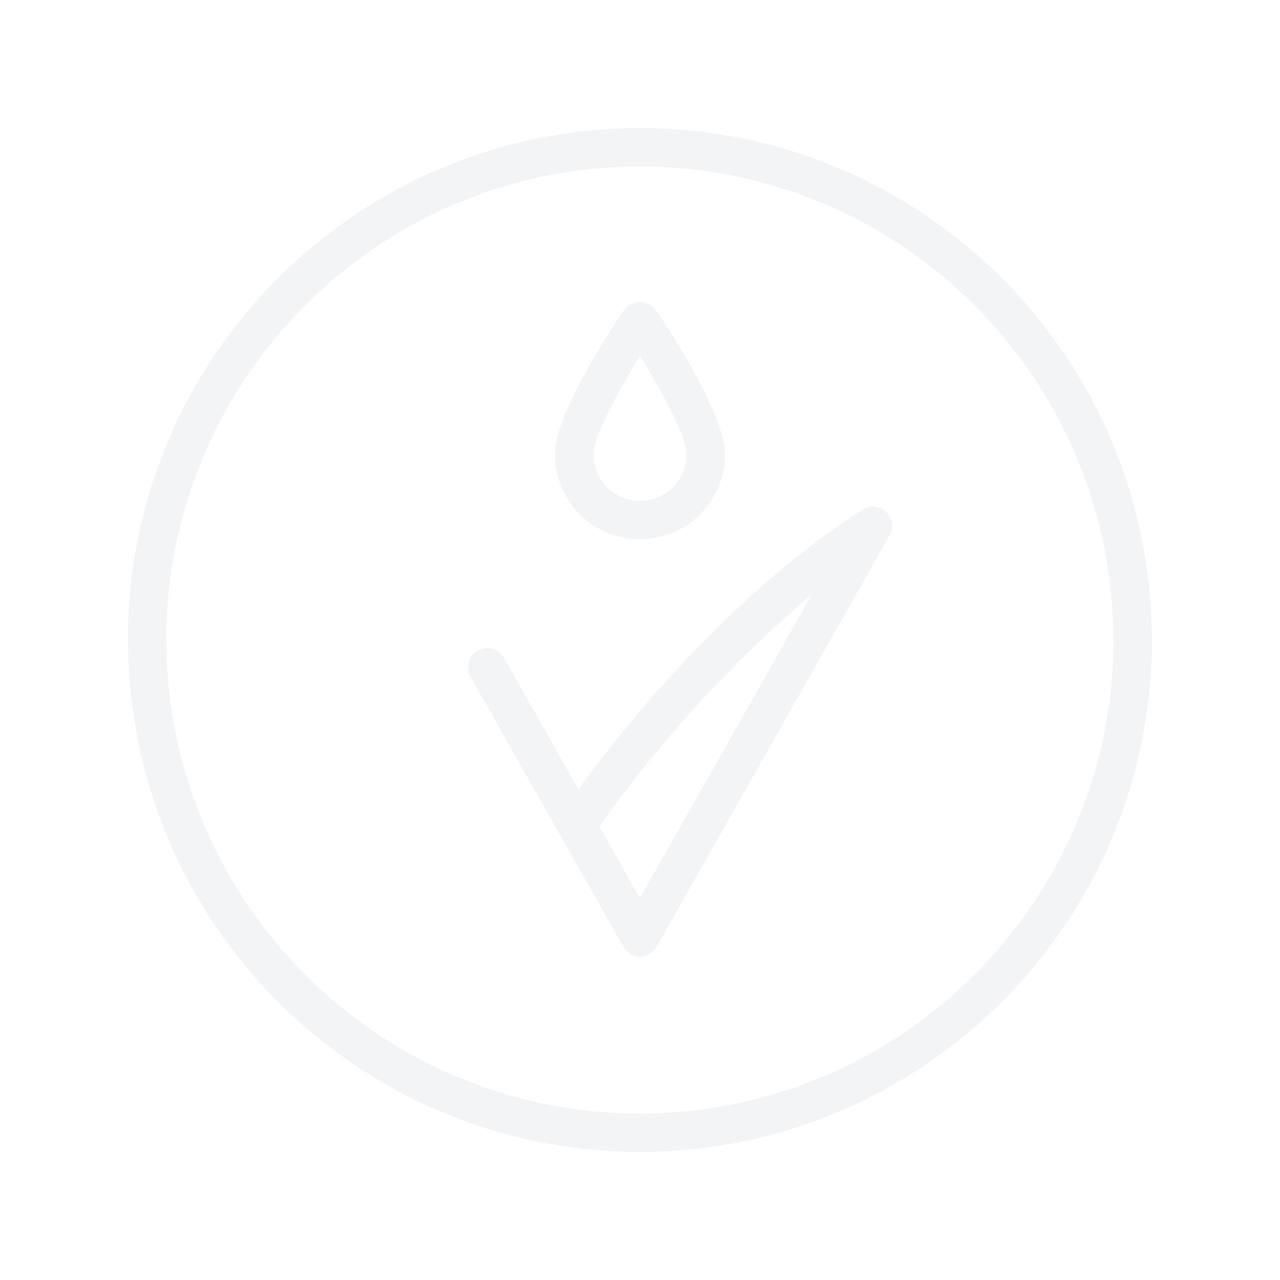 HUMBLE BRUSH Bamboo Toothbrush Case